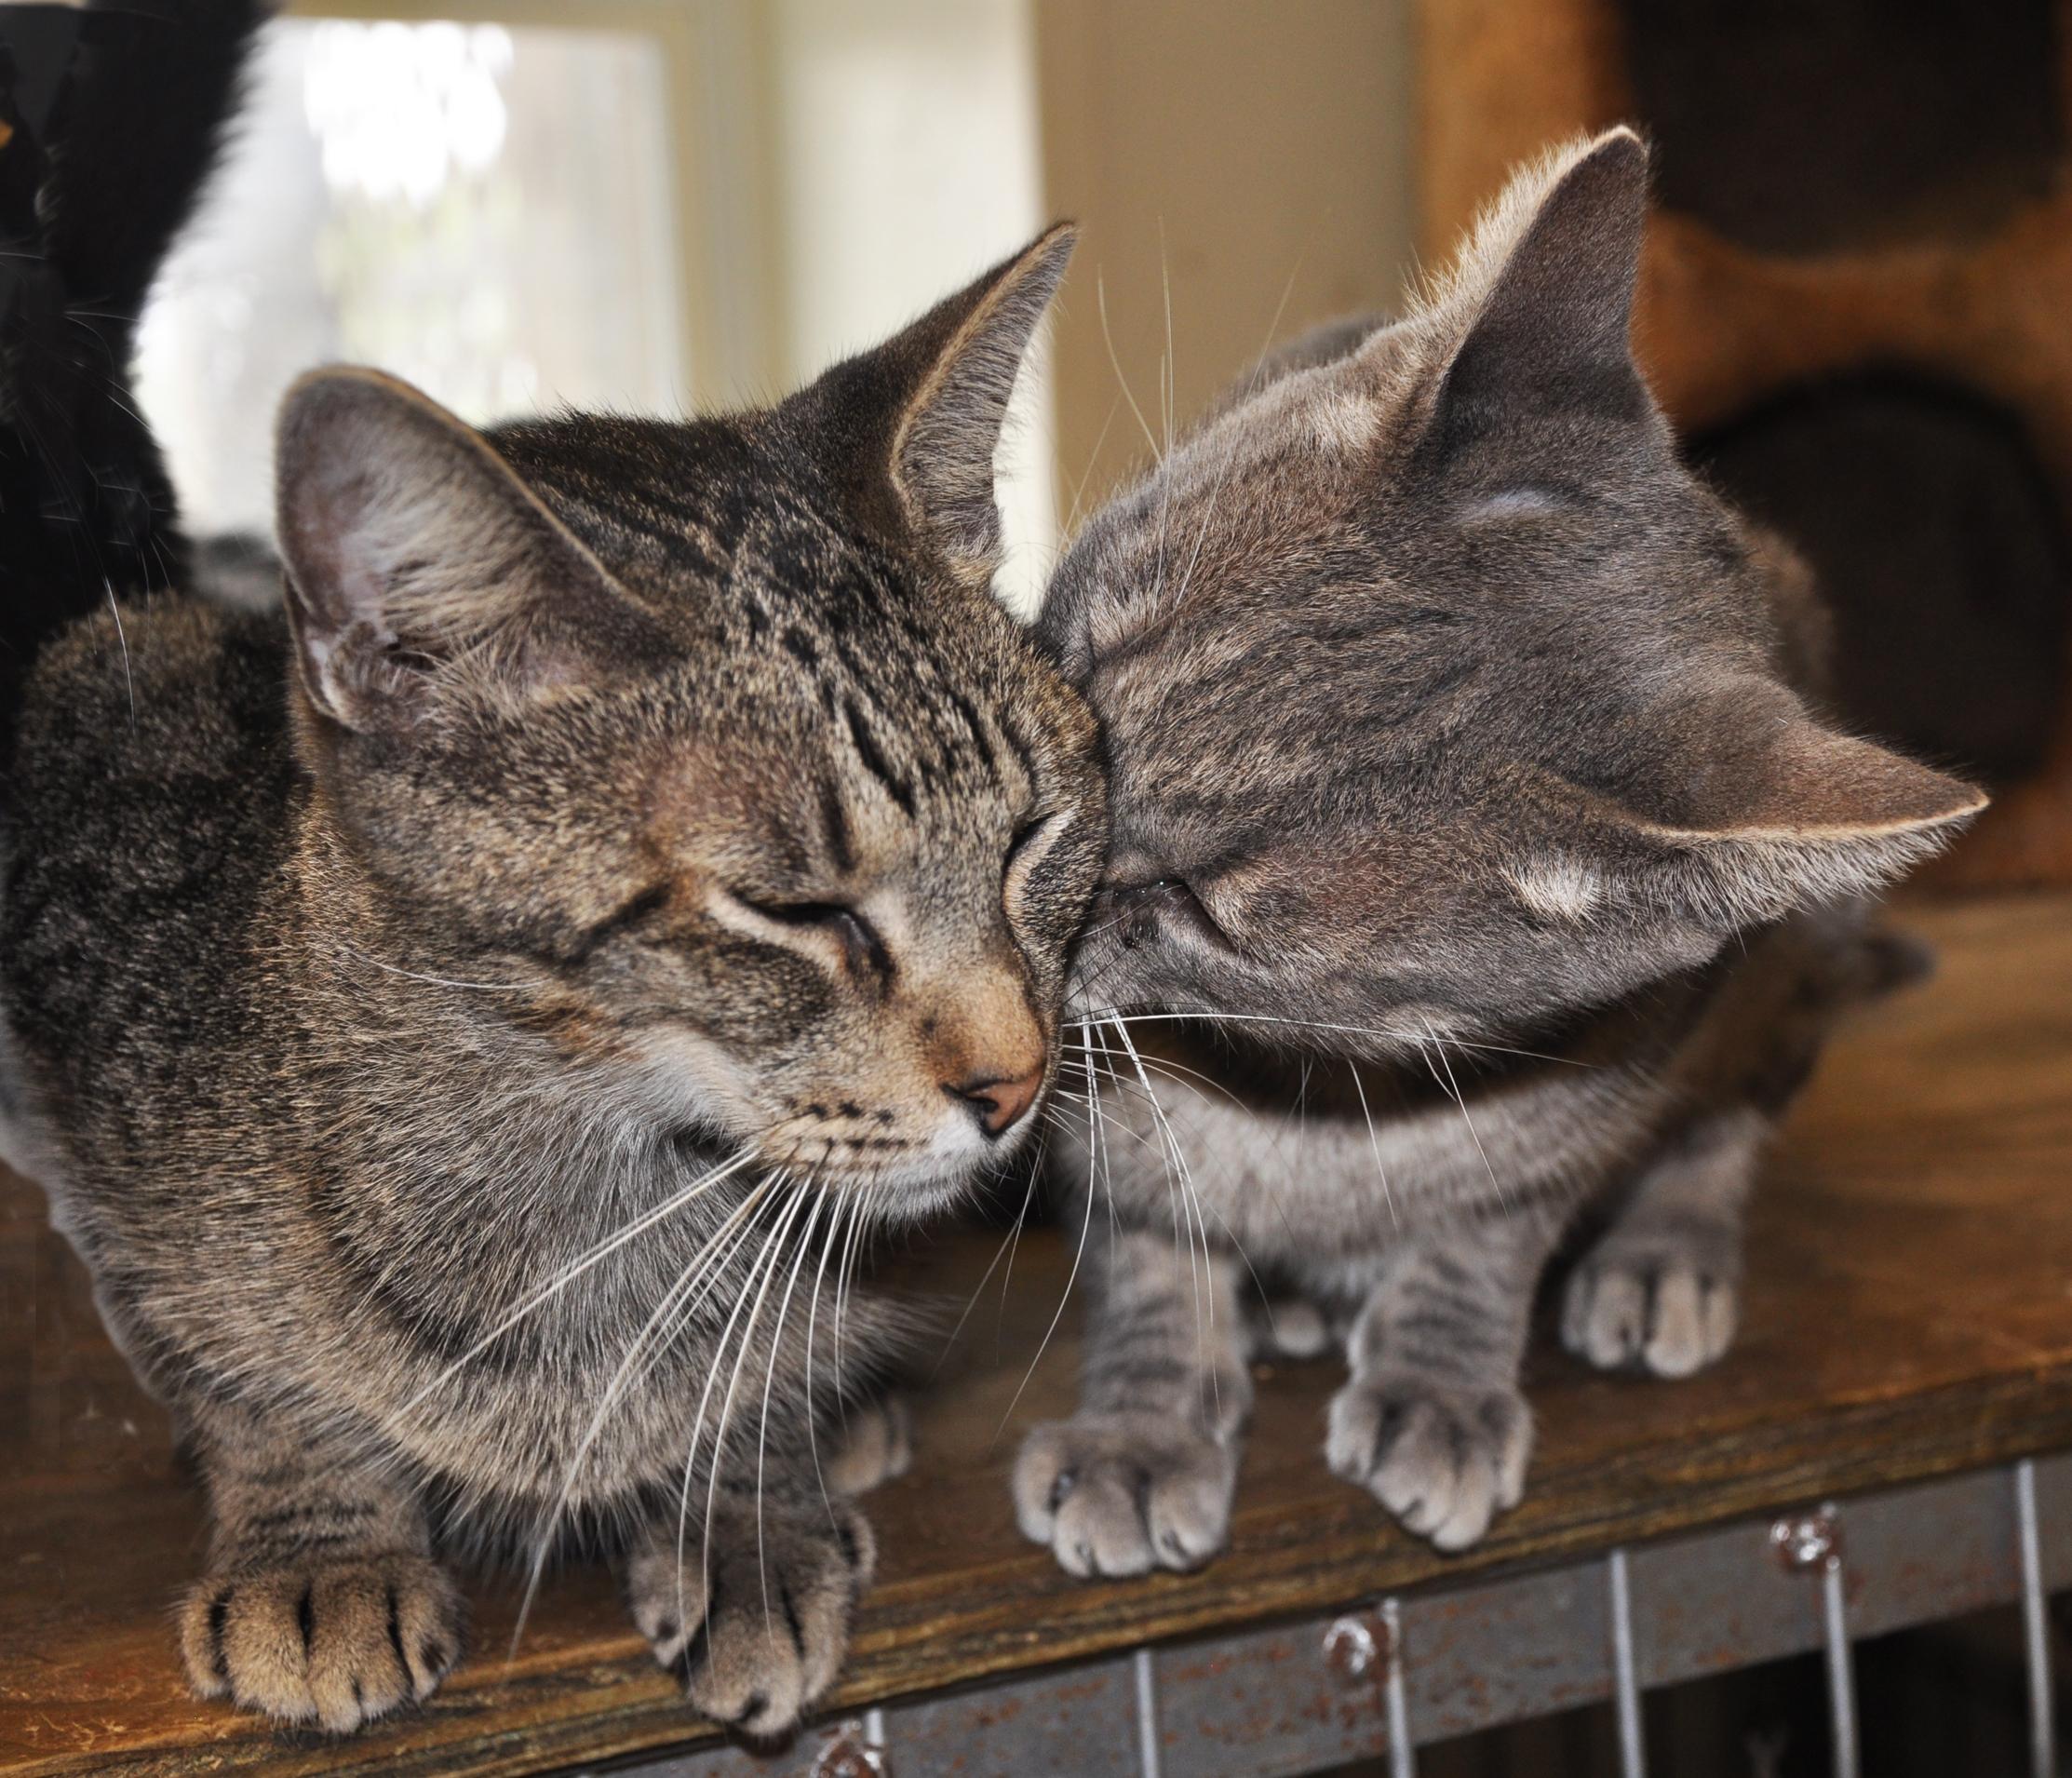 Home - Peewee's Pet Adoption World & Sanctuary, Inc.